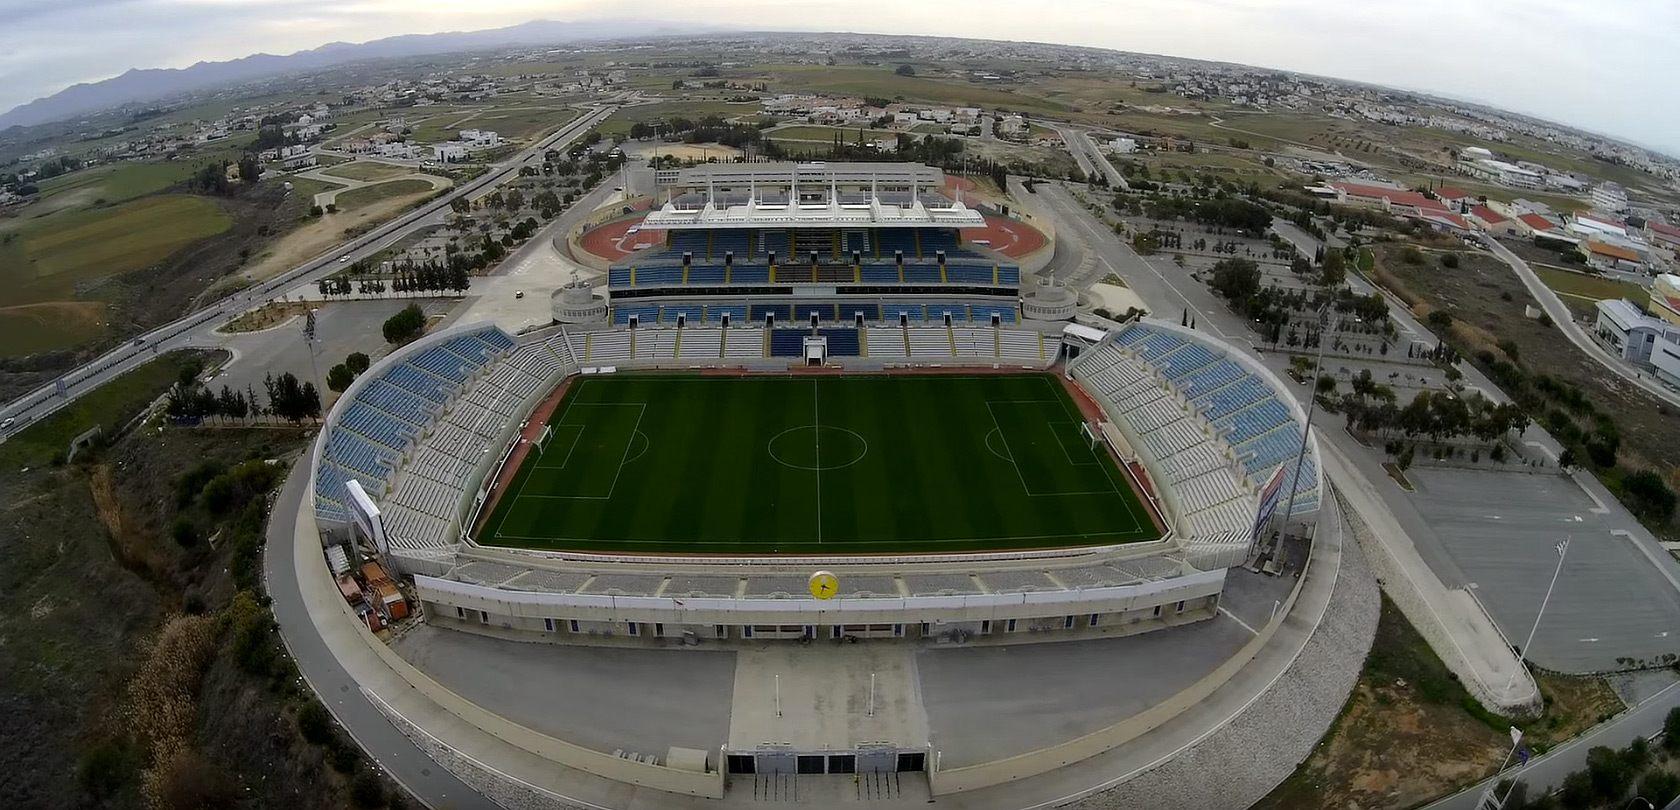 http://stadiumdb.com/pictures/stadiums/cyp/neo_gsp/neo_gsp11.jpg